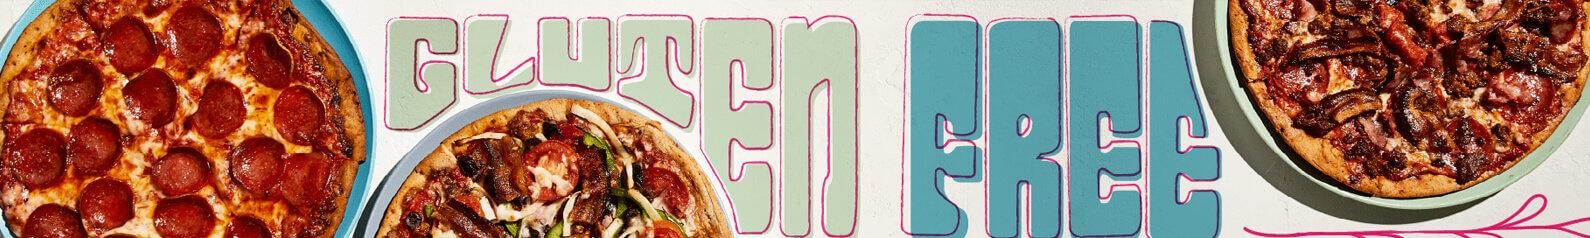 Gluten-Free Image